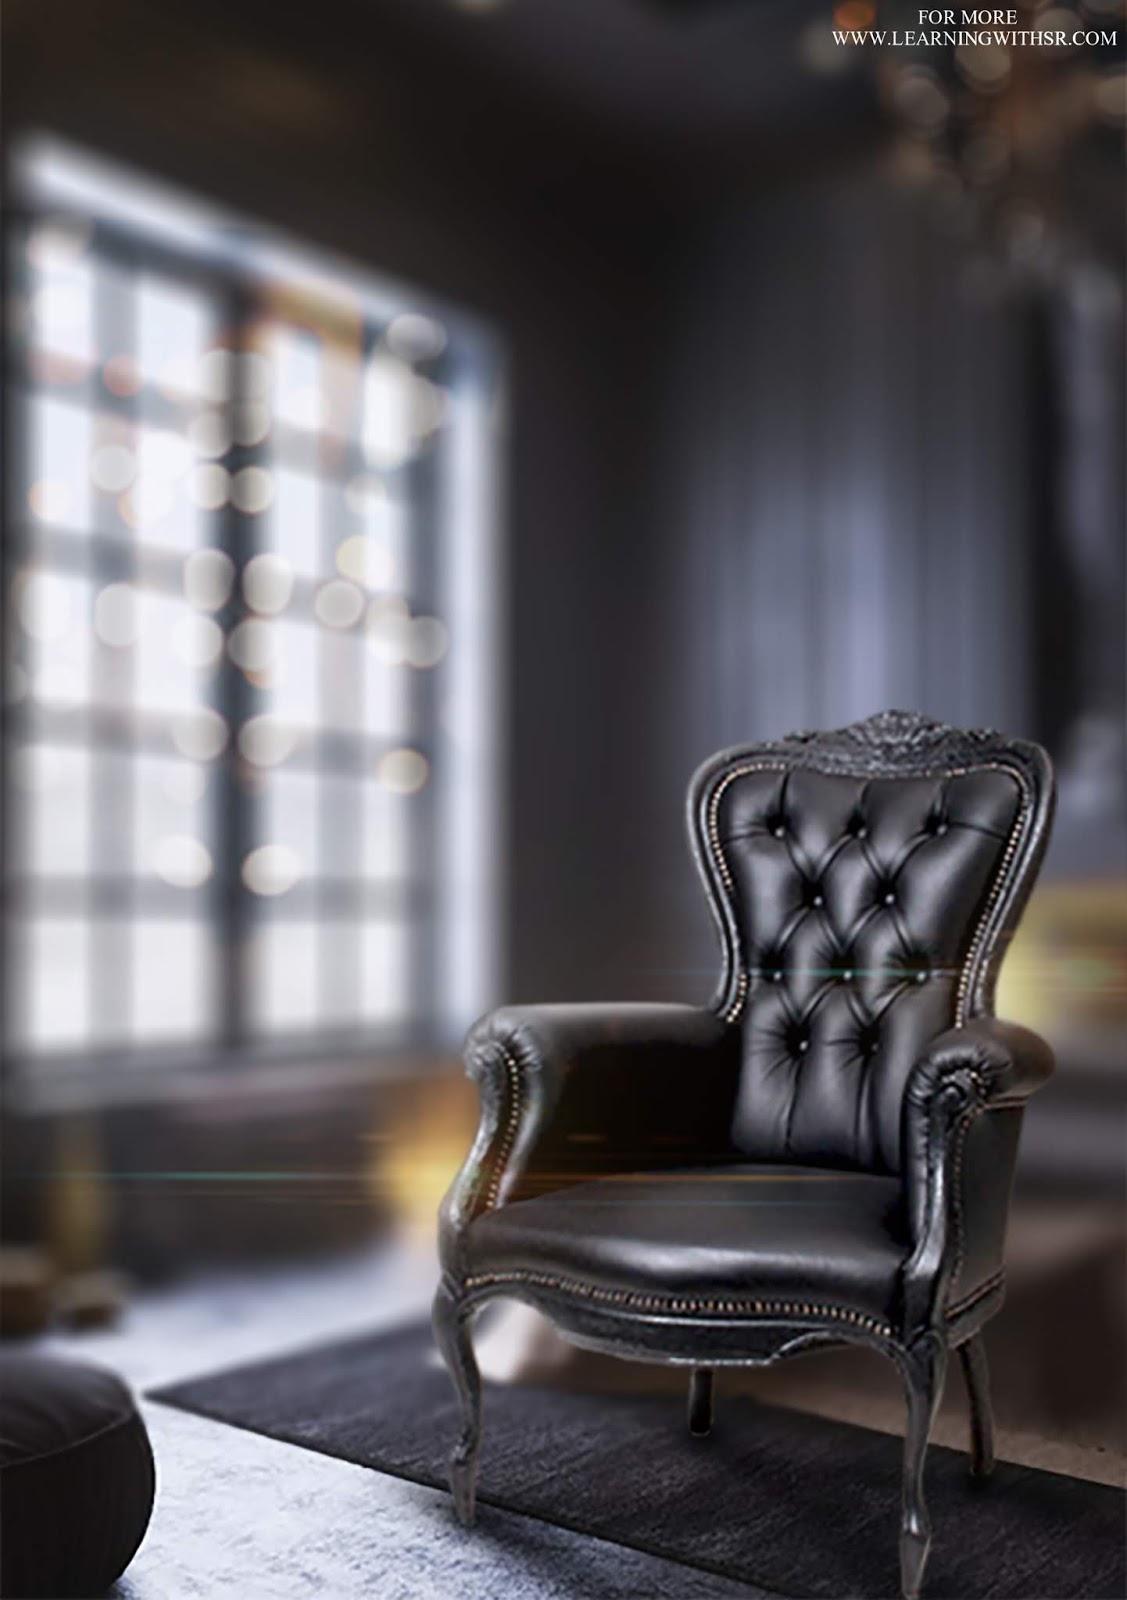 Dark cb backgrounds 2019, new cb background zip file,blur ...